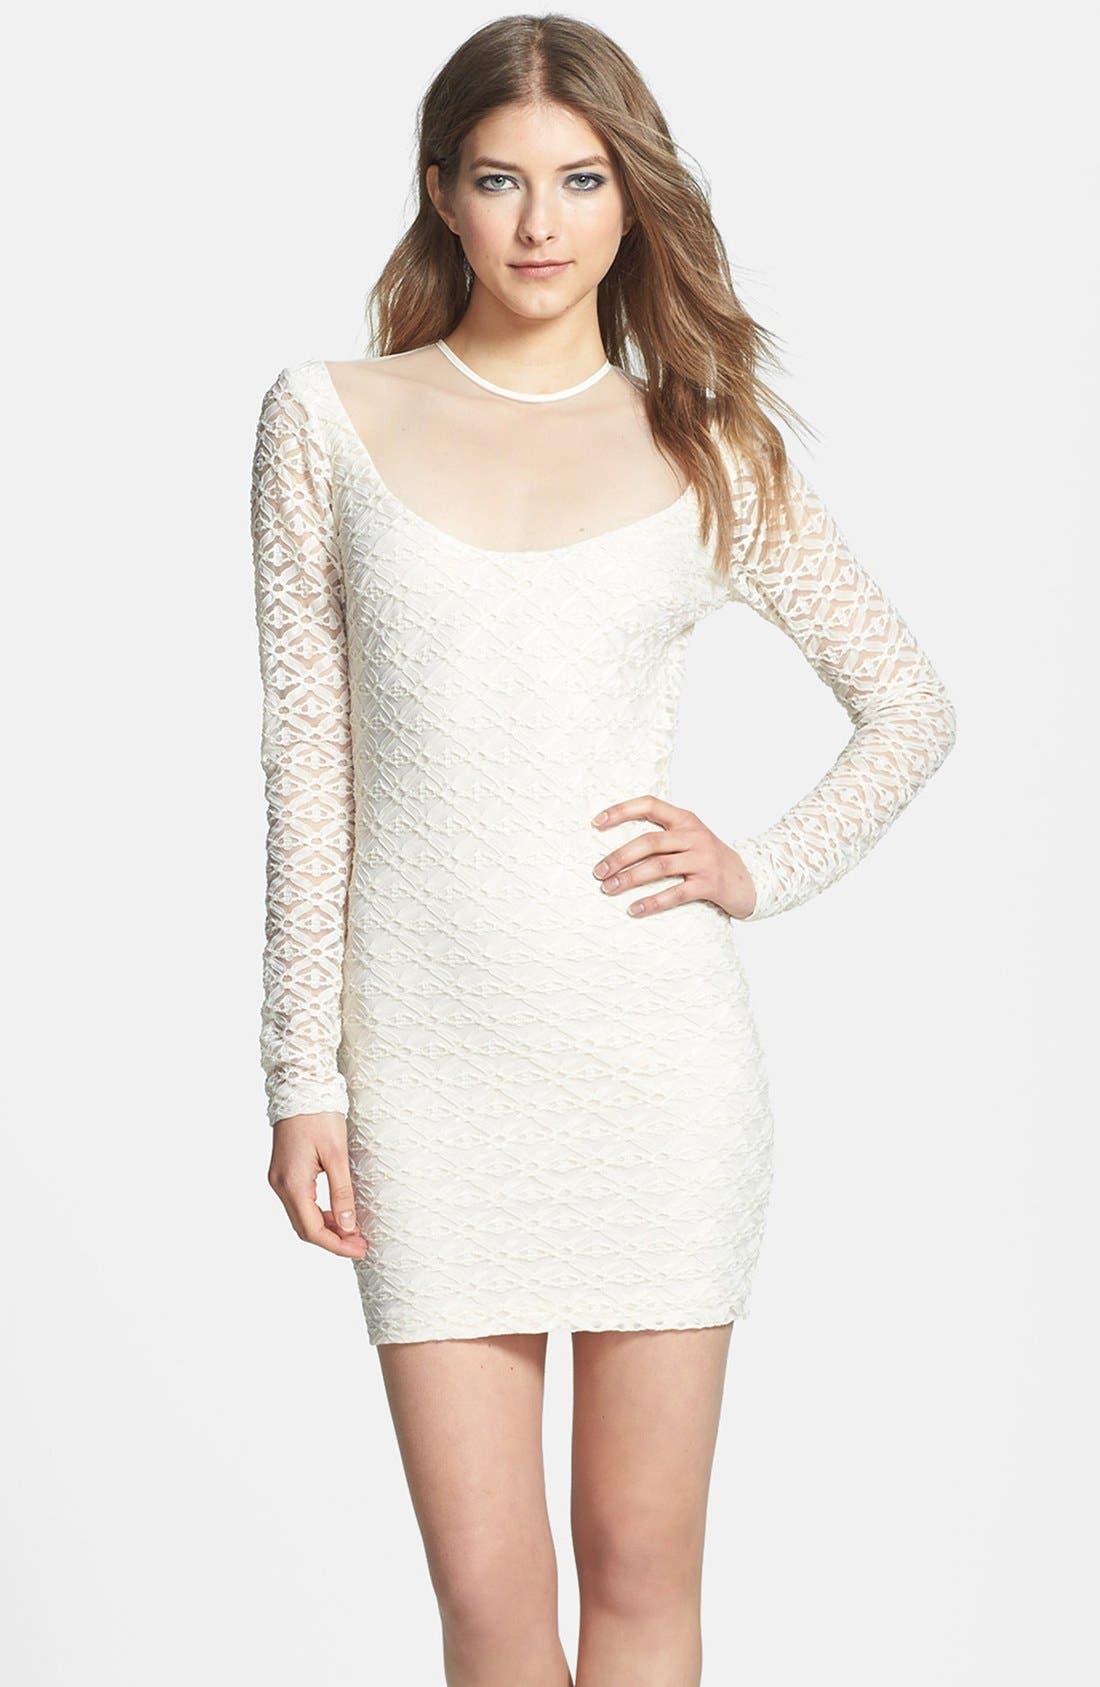 Alternate Image 1 Selected - Dress the Population 'Jessica' Textured Metallic Body-Con Dress